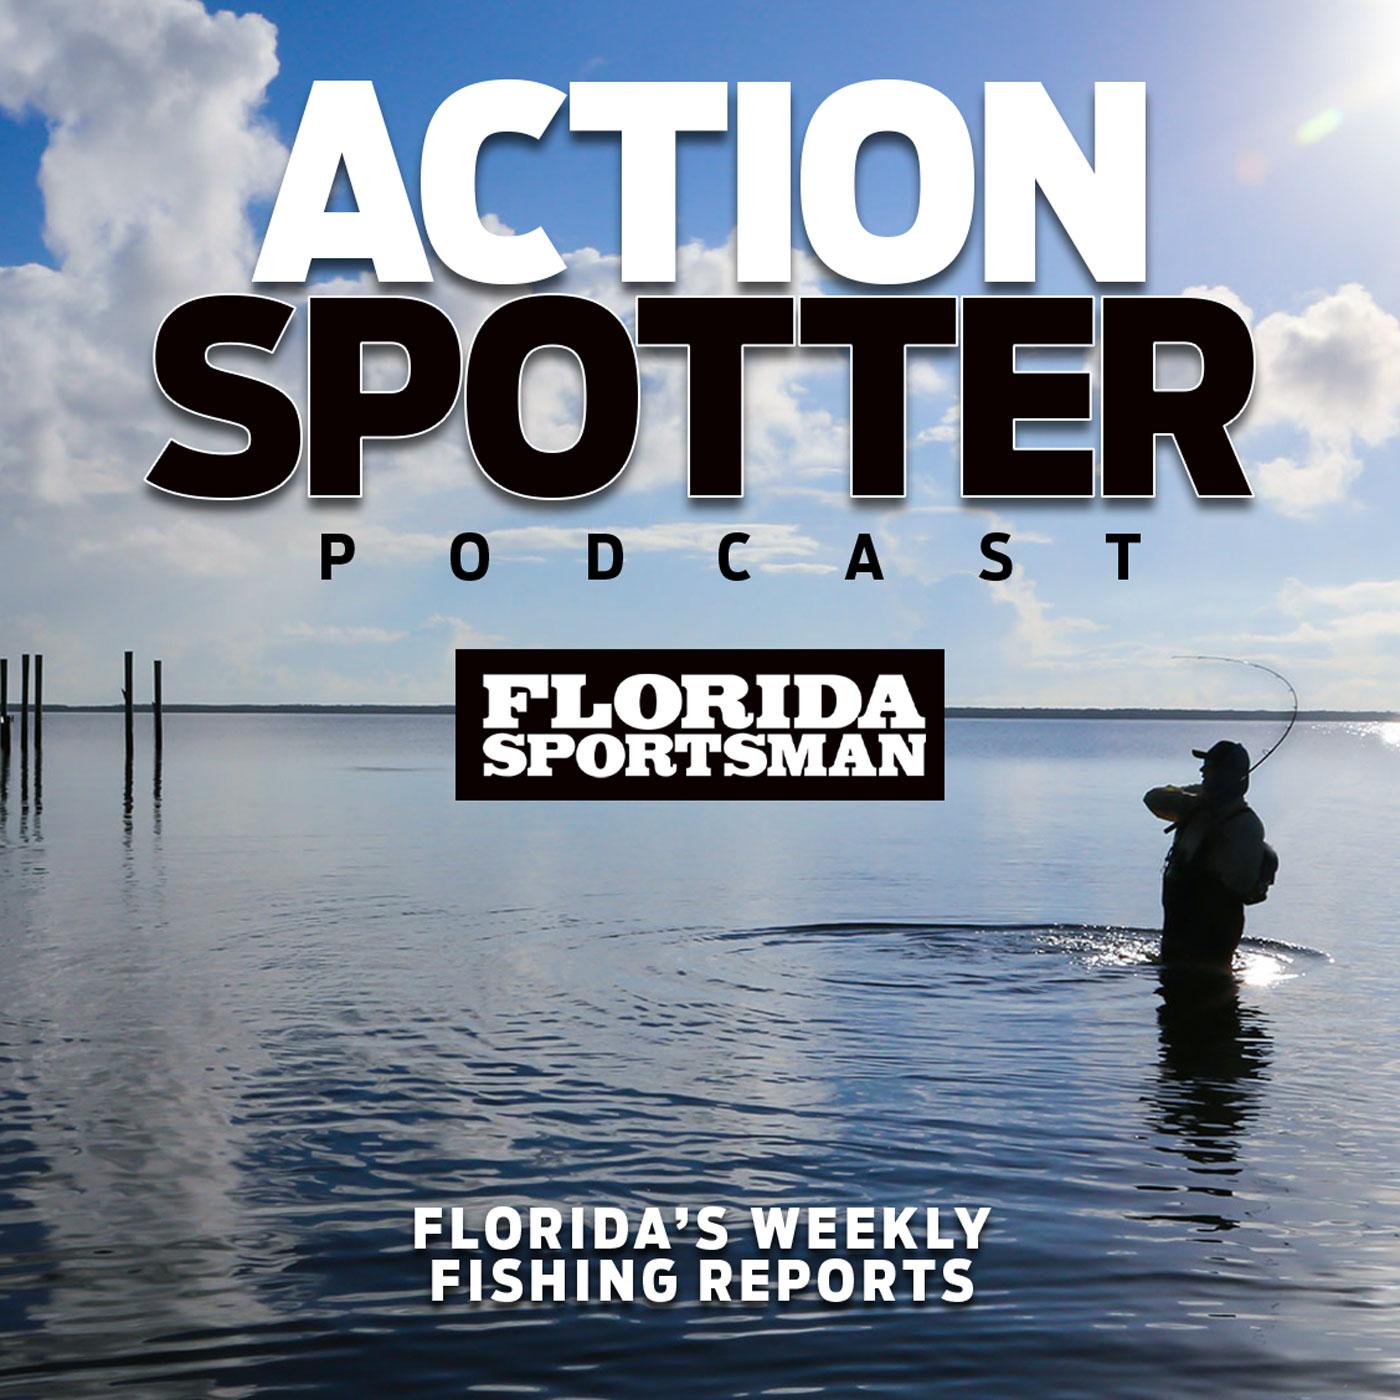 Florida Sportsman Action Spotter Podcast show art